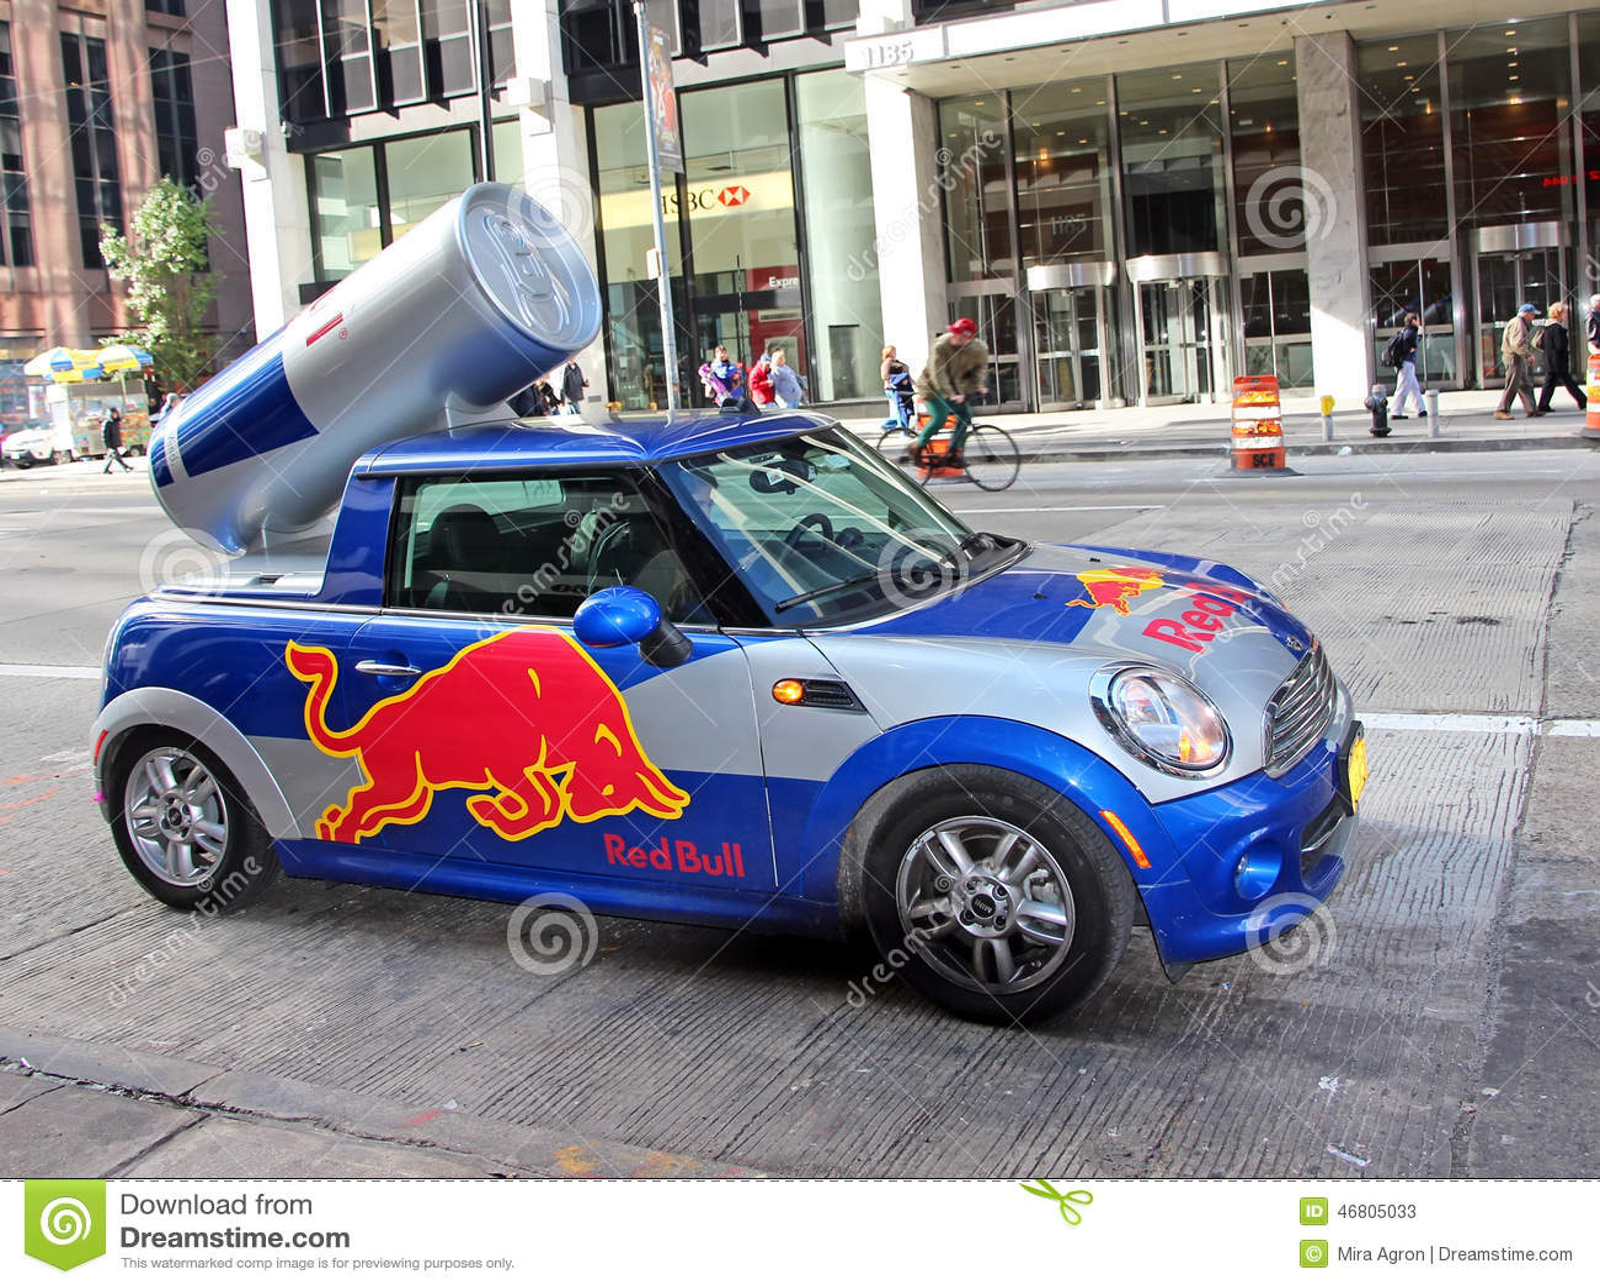 Street Dreams Auto >> Red Bull Mini Cooper editorial stock photo. Image of back - 46805033